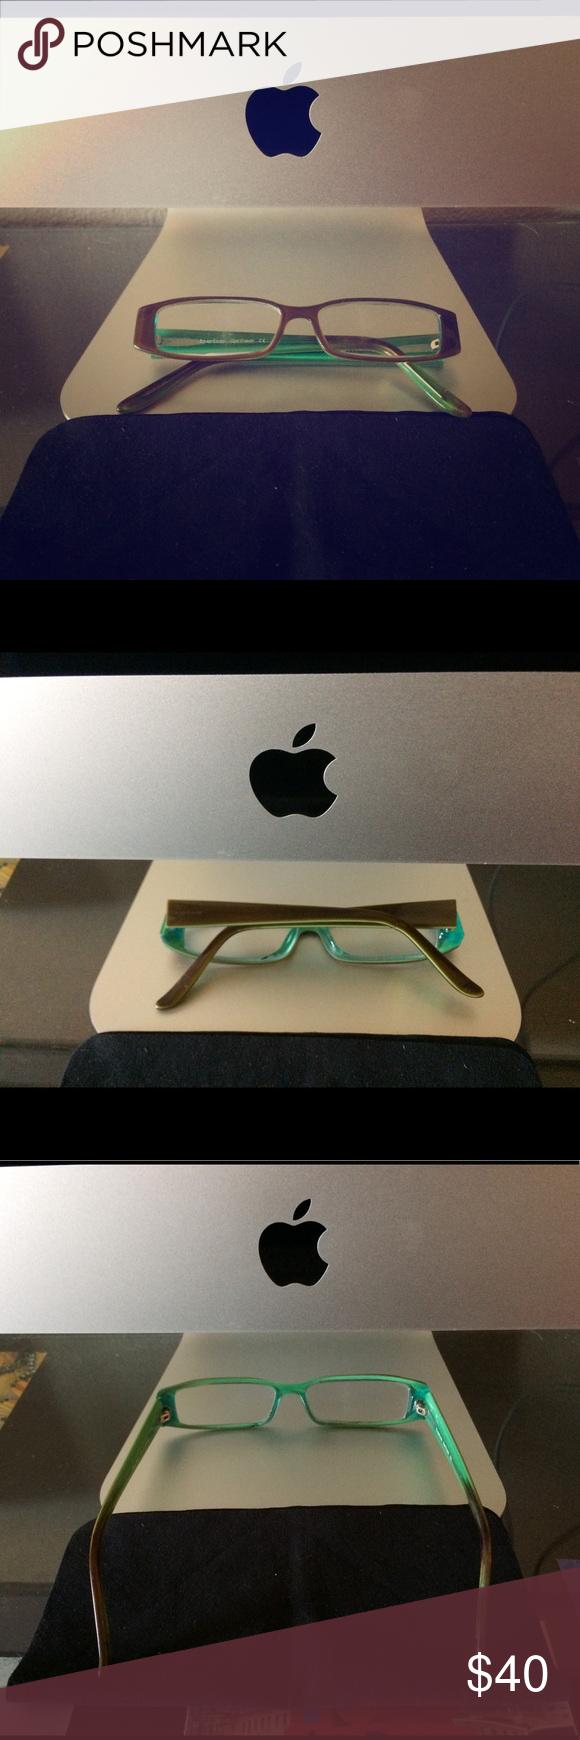 Bebe prescription eyeglasses Lenses show signs of use ...